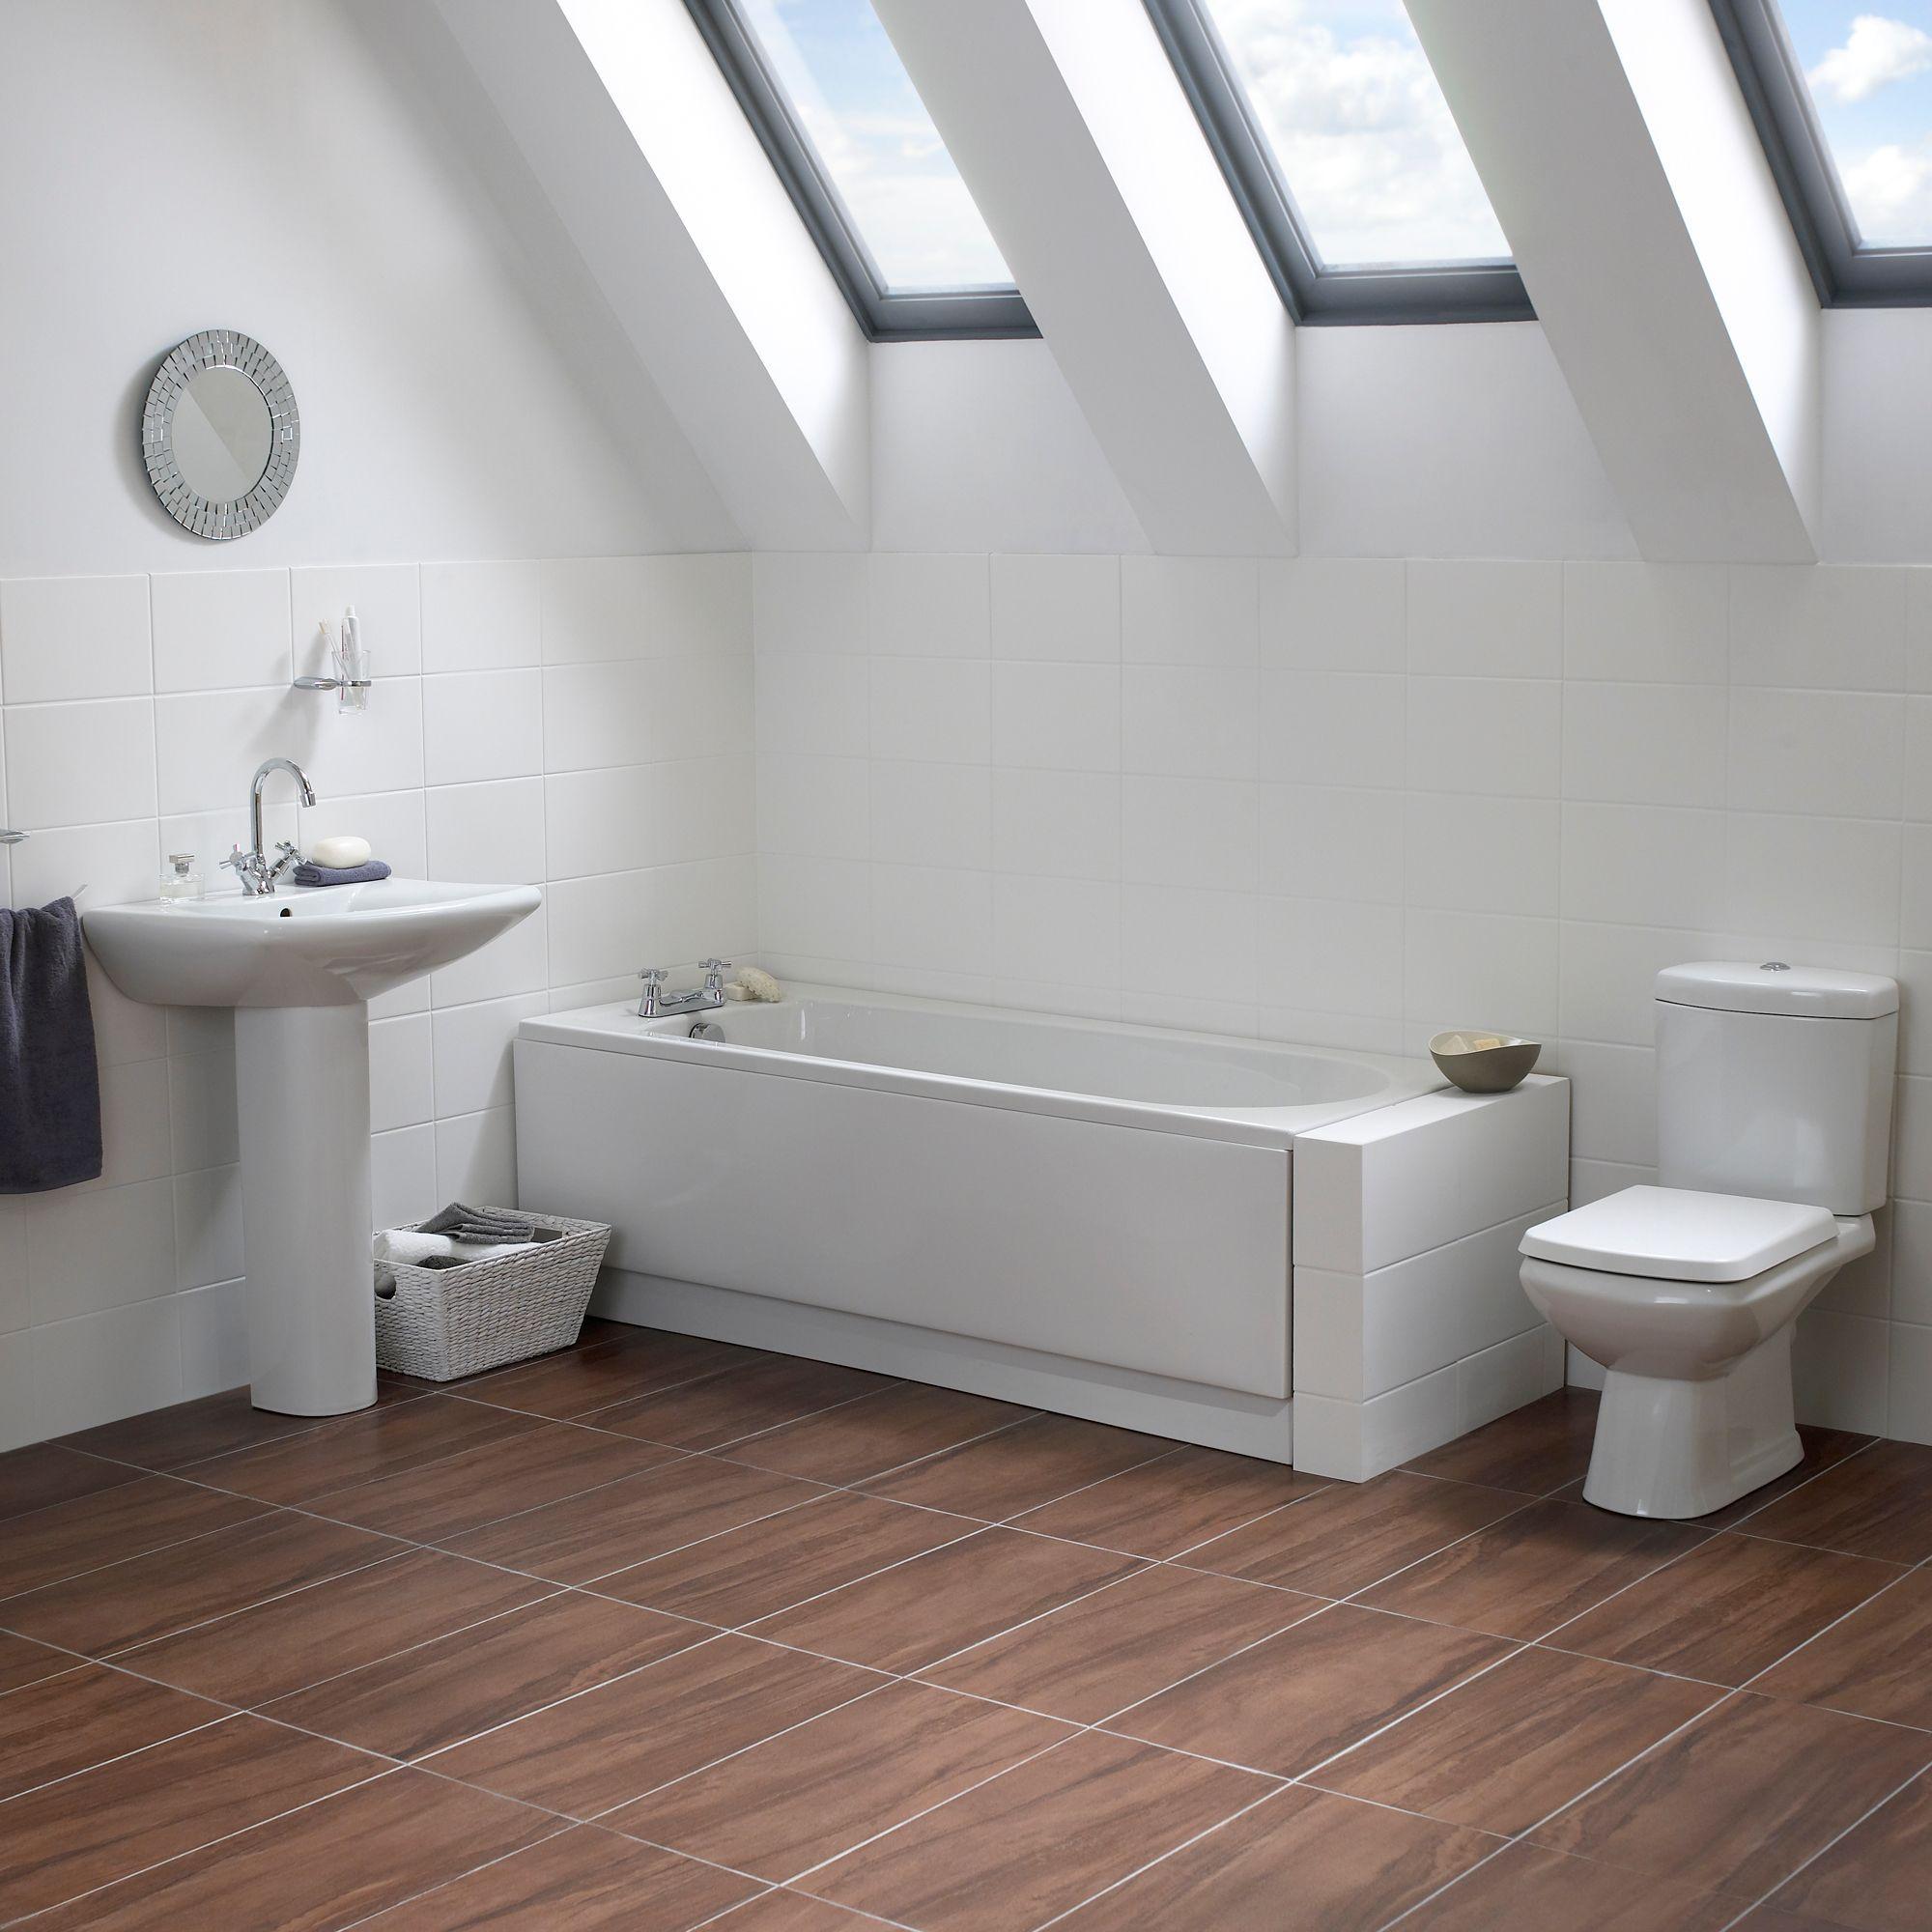 B And Q Bathrooms Suites. Cooke Lewis Seattle Bath Toilet Basin Tap Pack Departments Diy At Bq